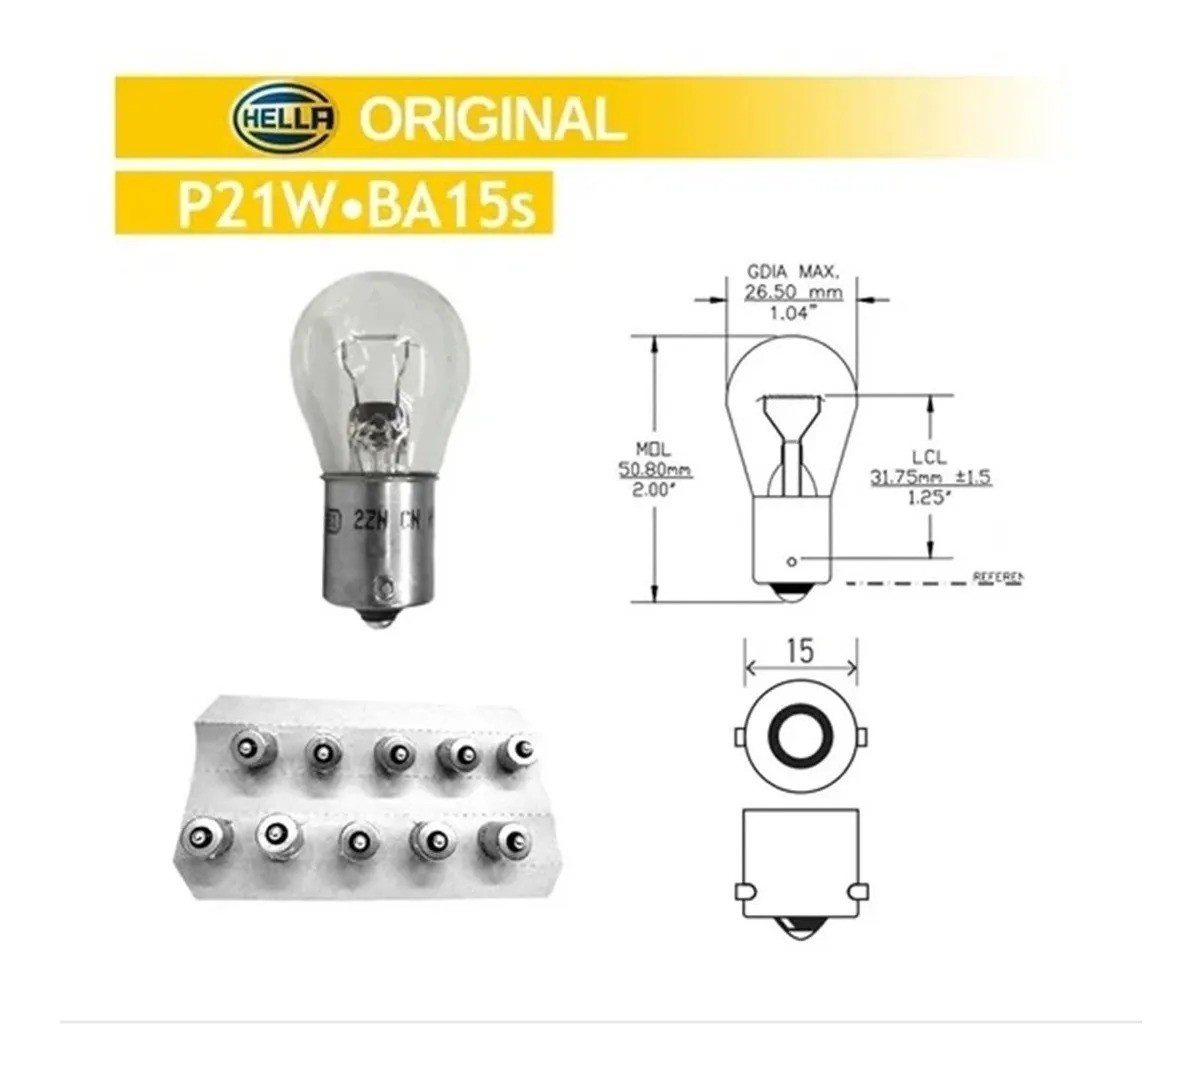 KIT 10 LAMPADAS CONVENCIONAIS 12V LANTERNA PW21 S8 12V 21W